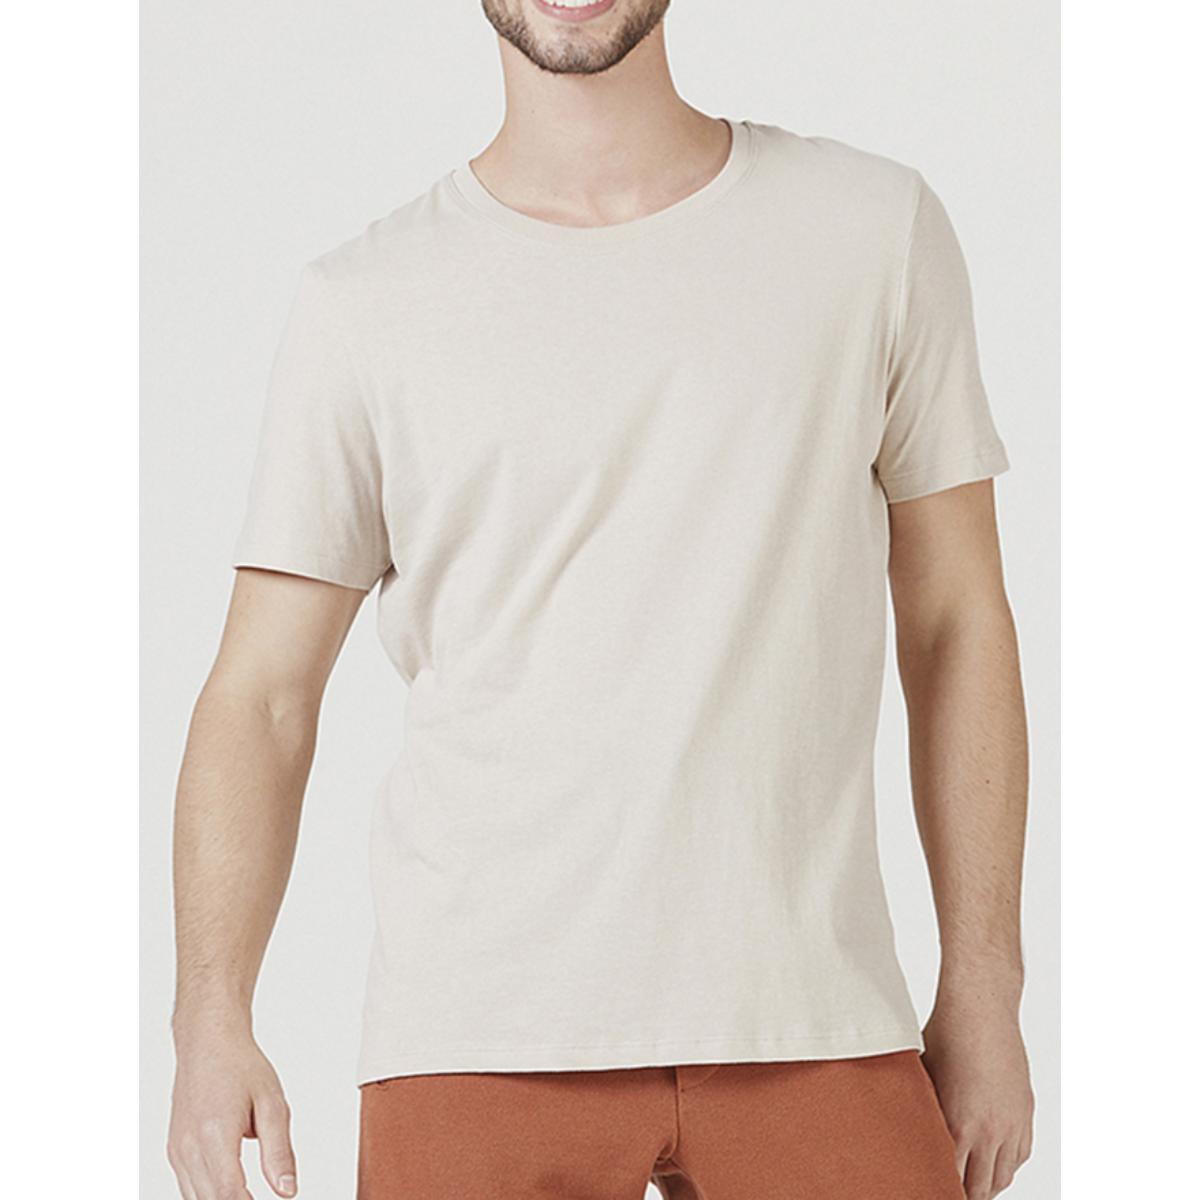 Camiseta Masculina Hering 0201 Hjmen Bege